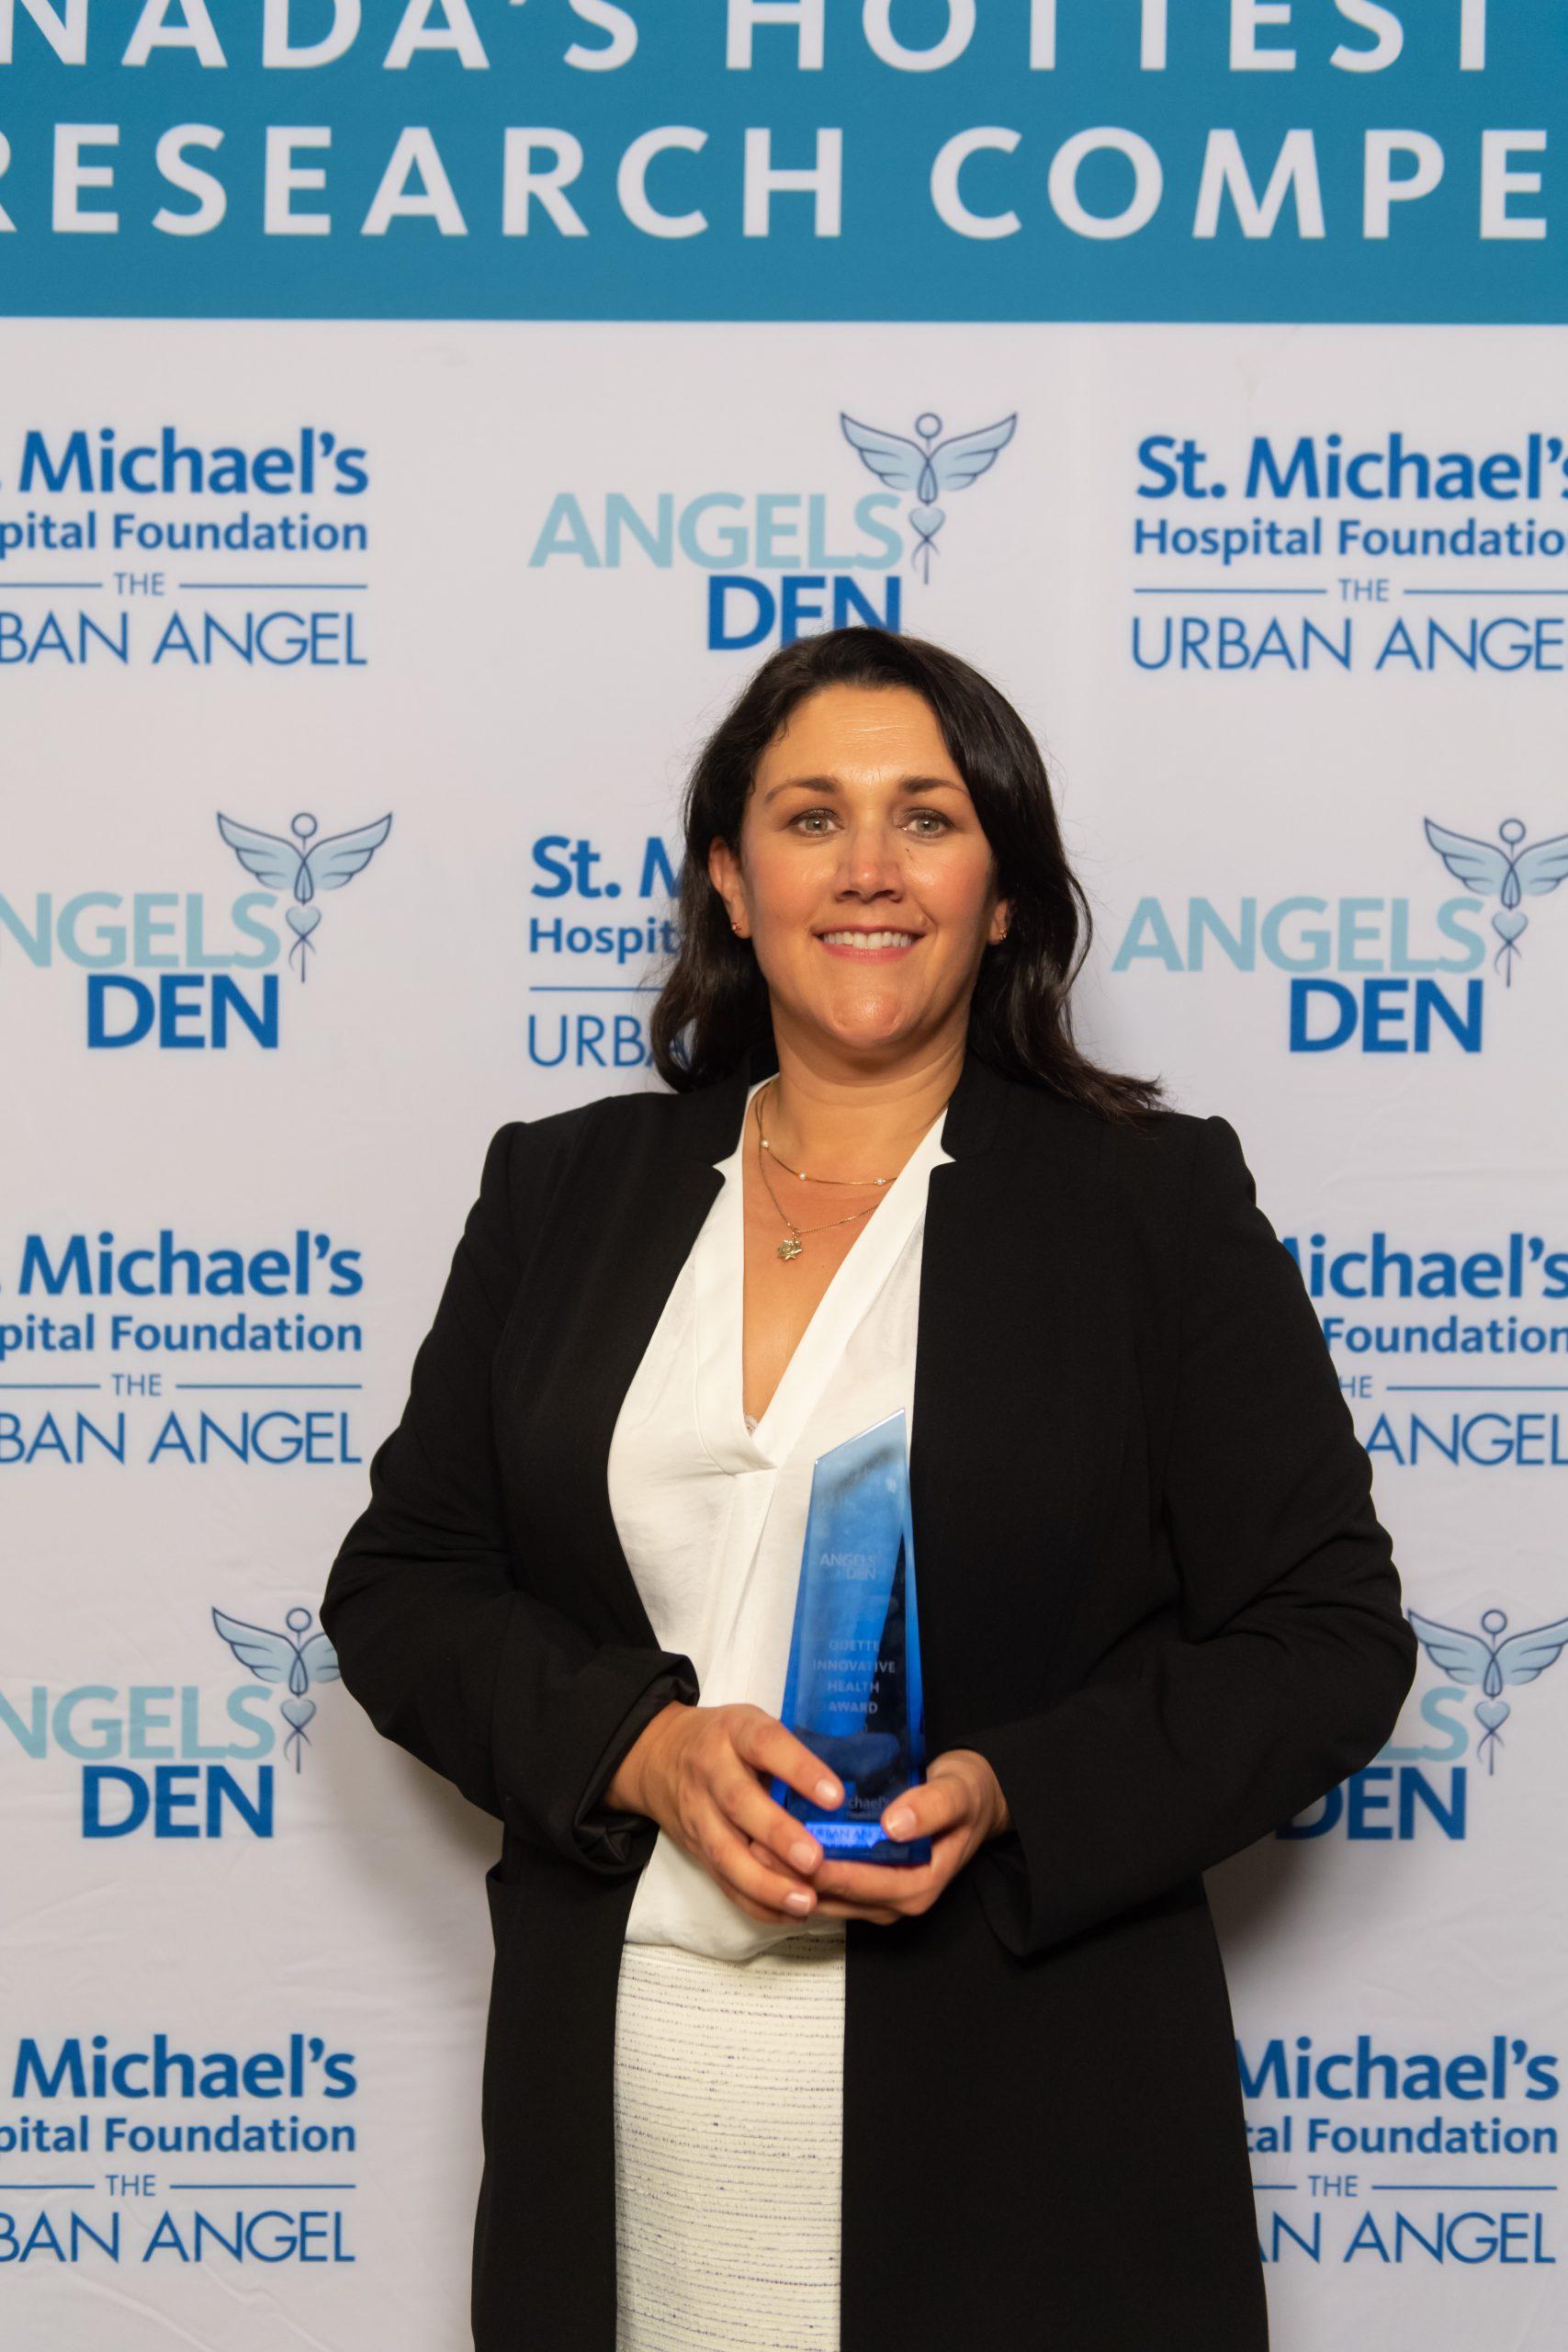 Dr. Karen Cross won the Odette Innovative Health Award for her work in tackling pressure injuries